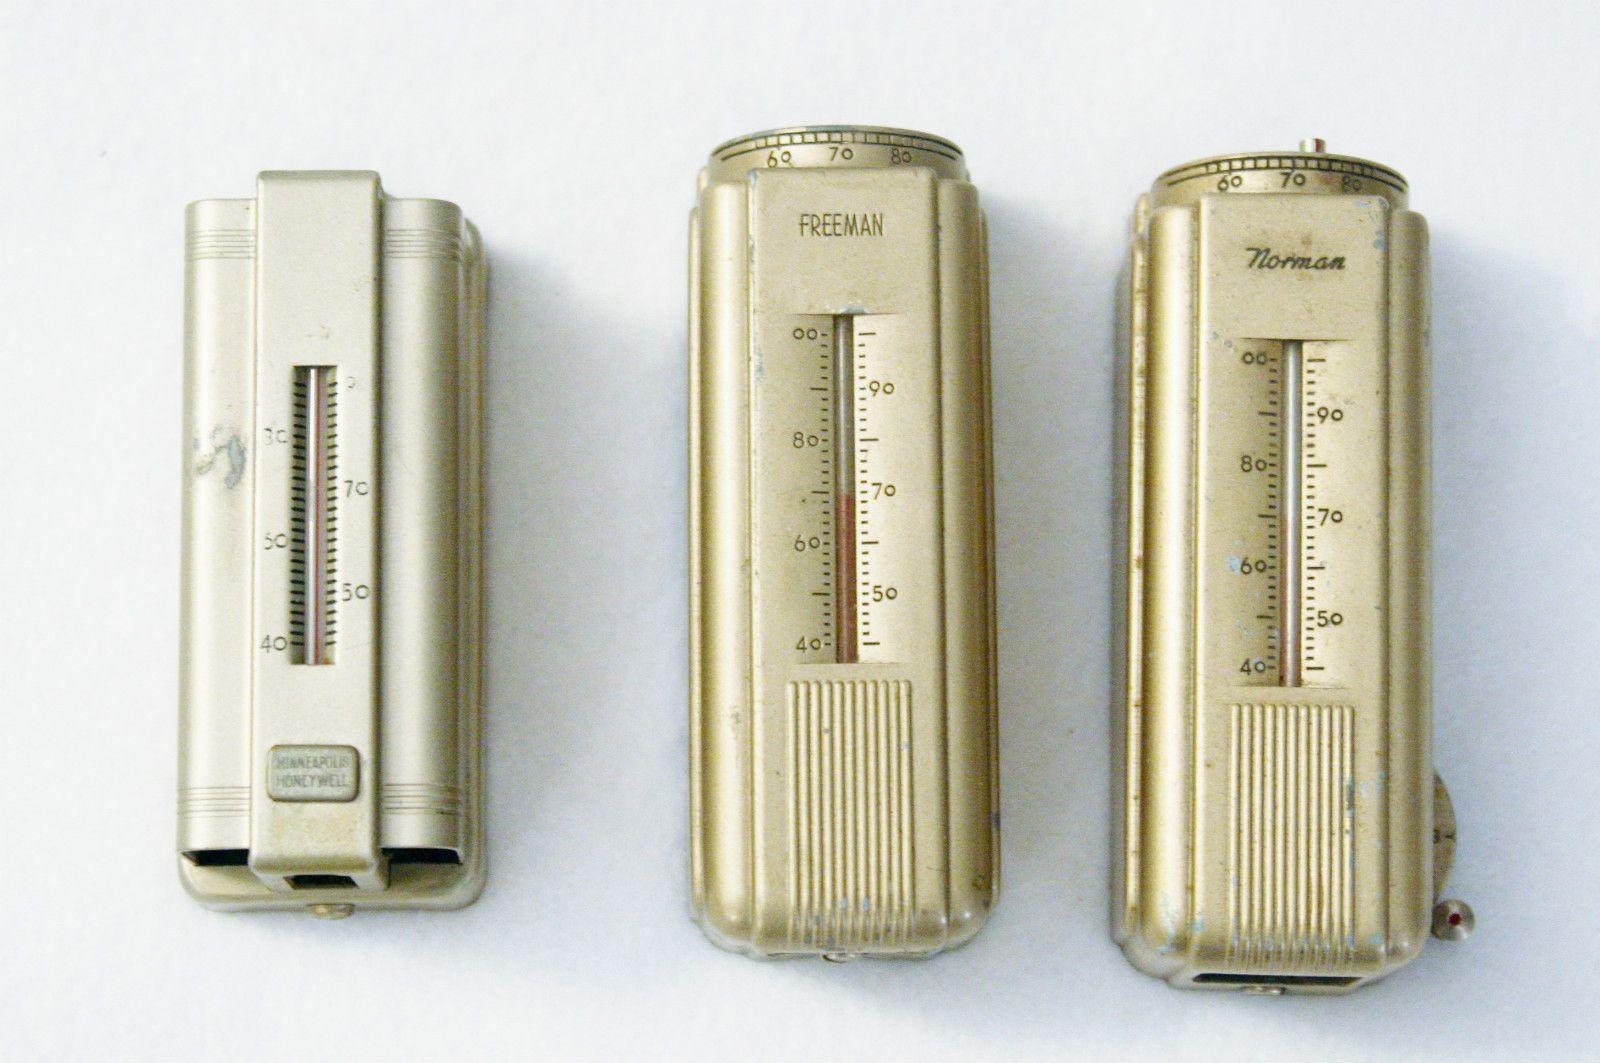 3 Vintage Wall Thermostats Honeywell Norman Freeman